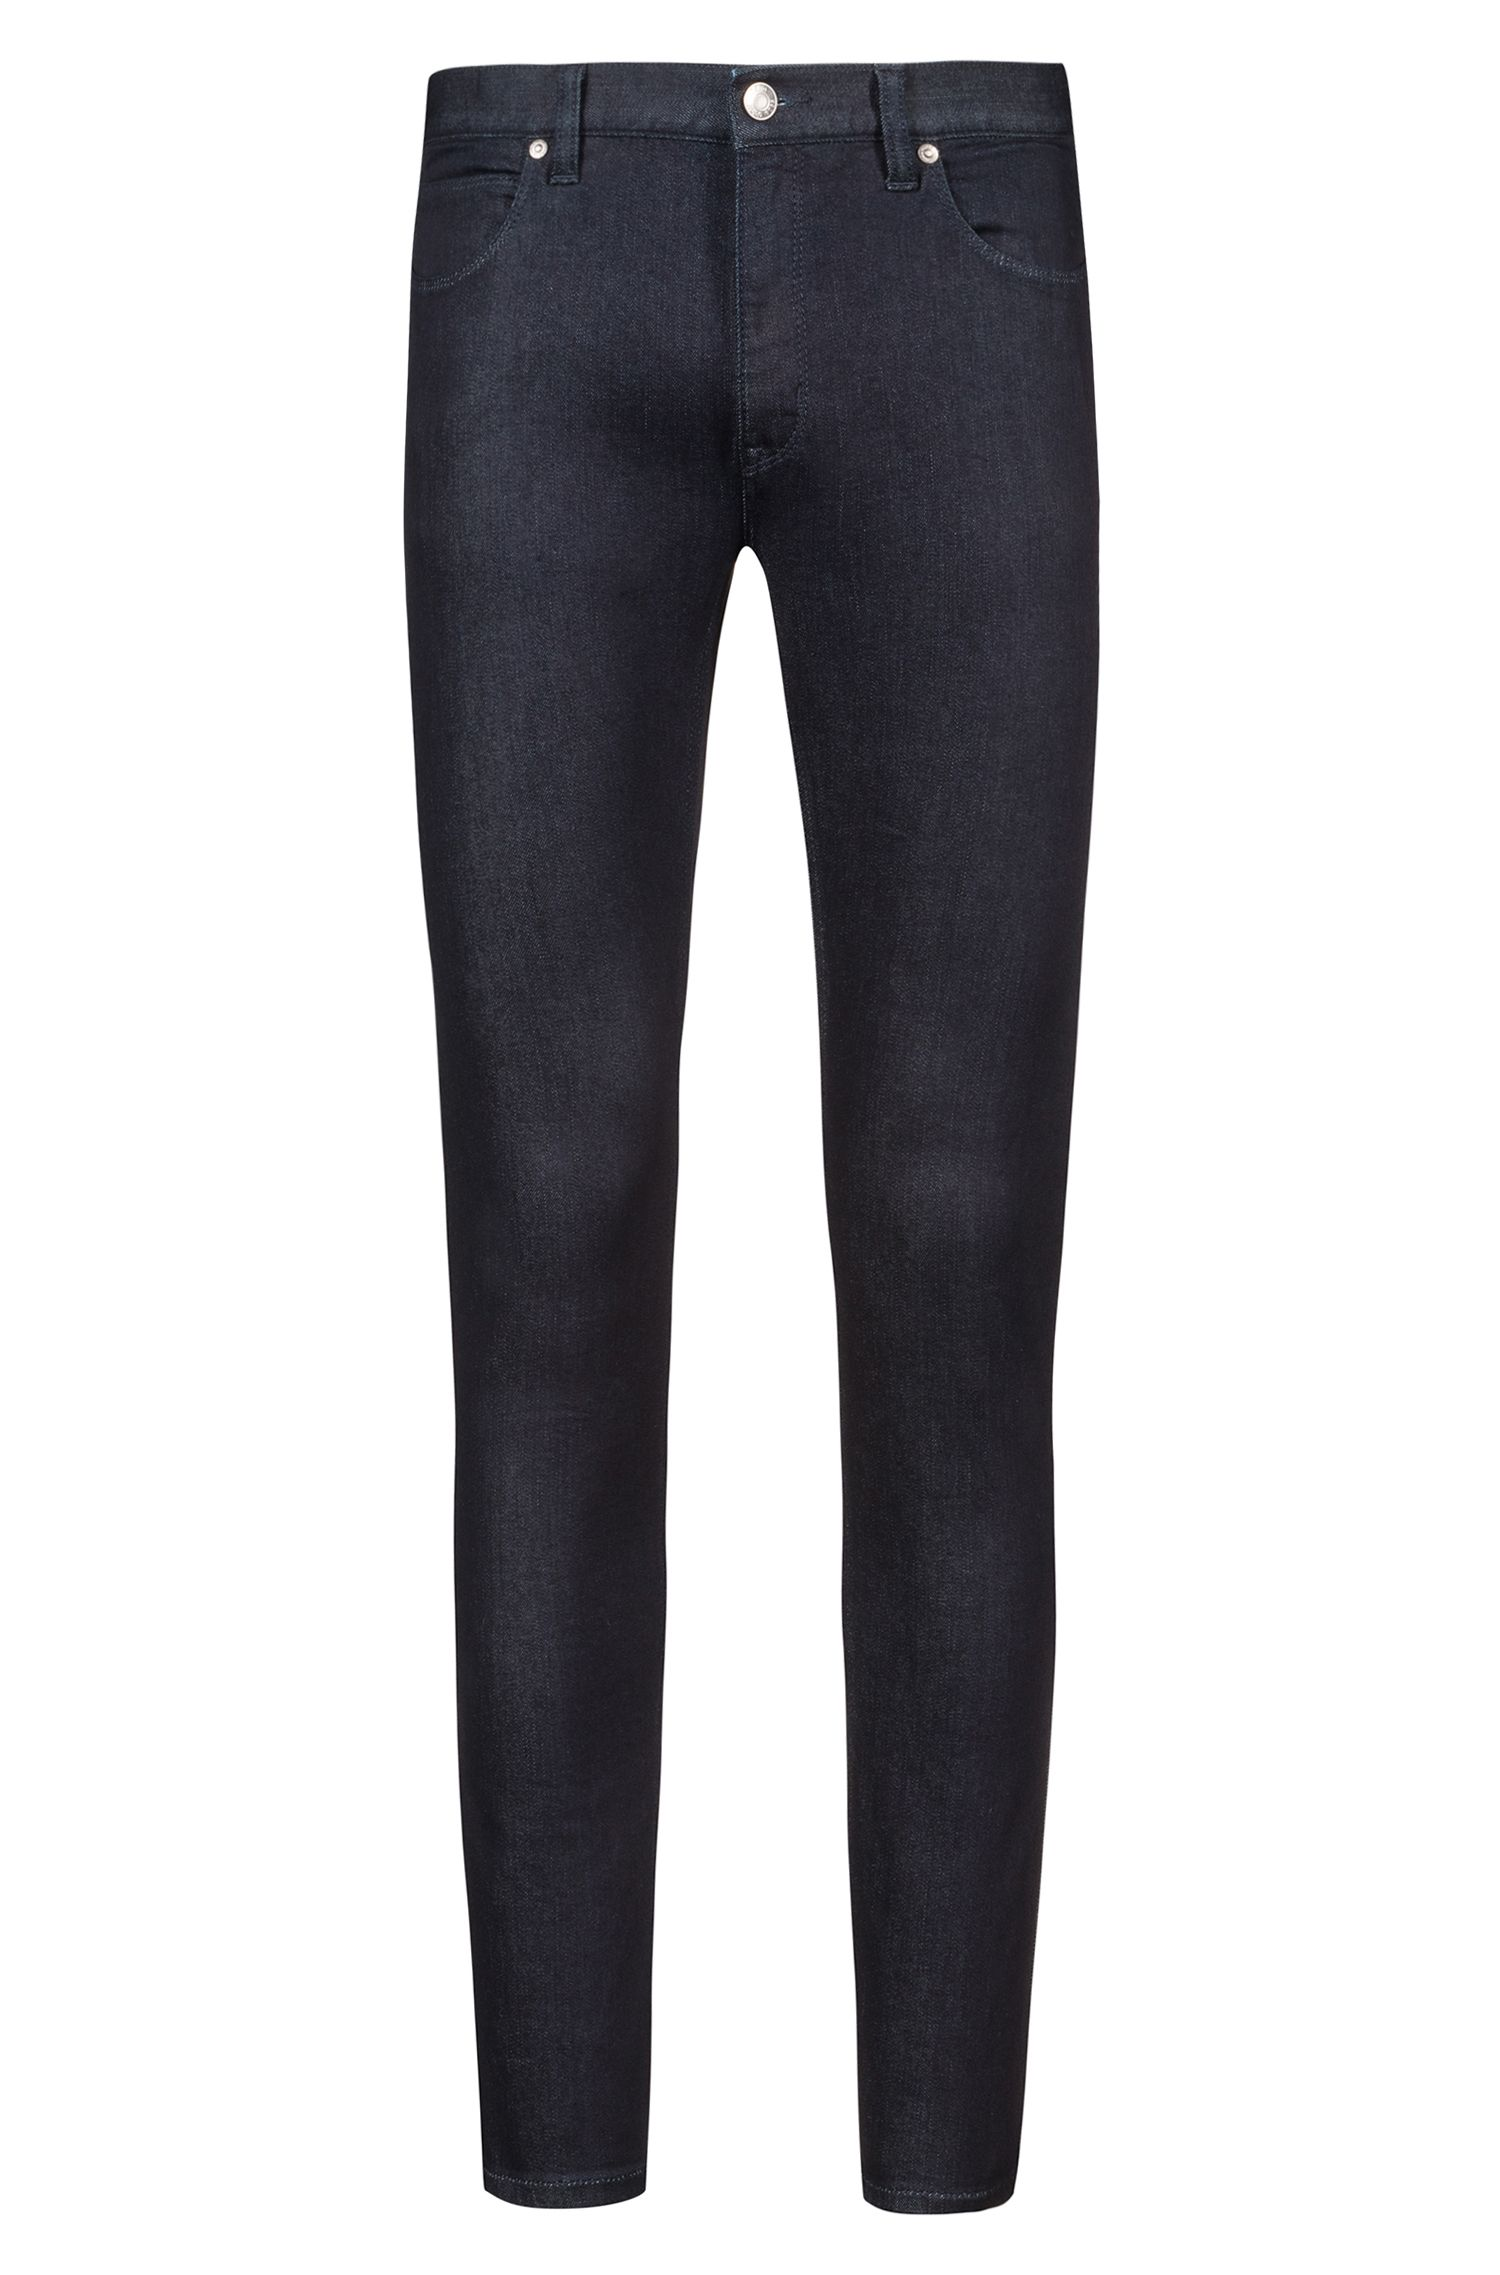 Jean Skinny Fit taille basse en denim stretch, Bleu foncé